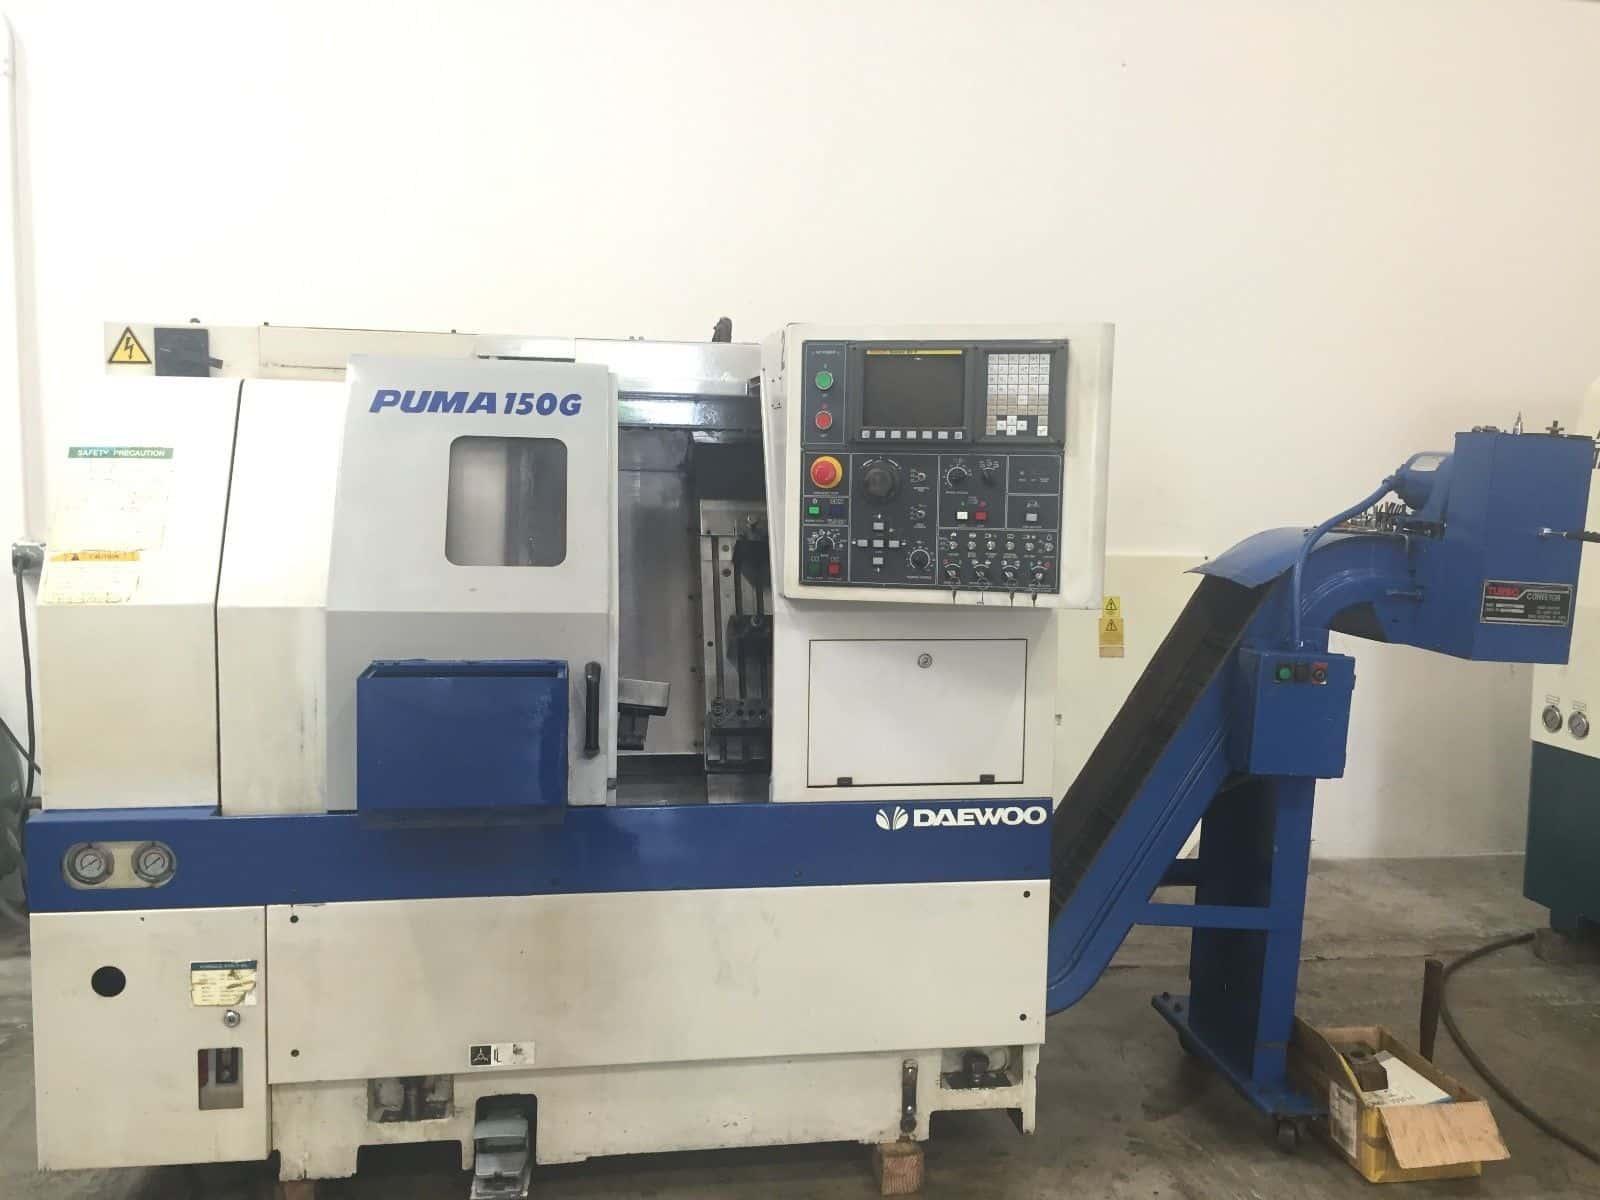 DAEWOO 150G CNC GANG LATHE - MachineStation